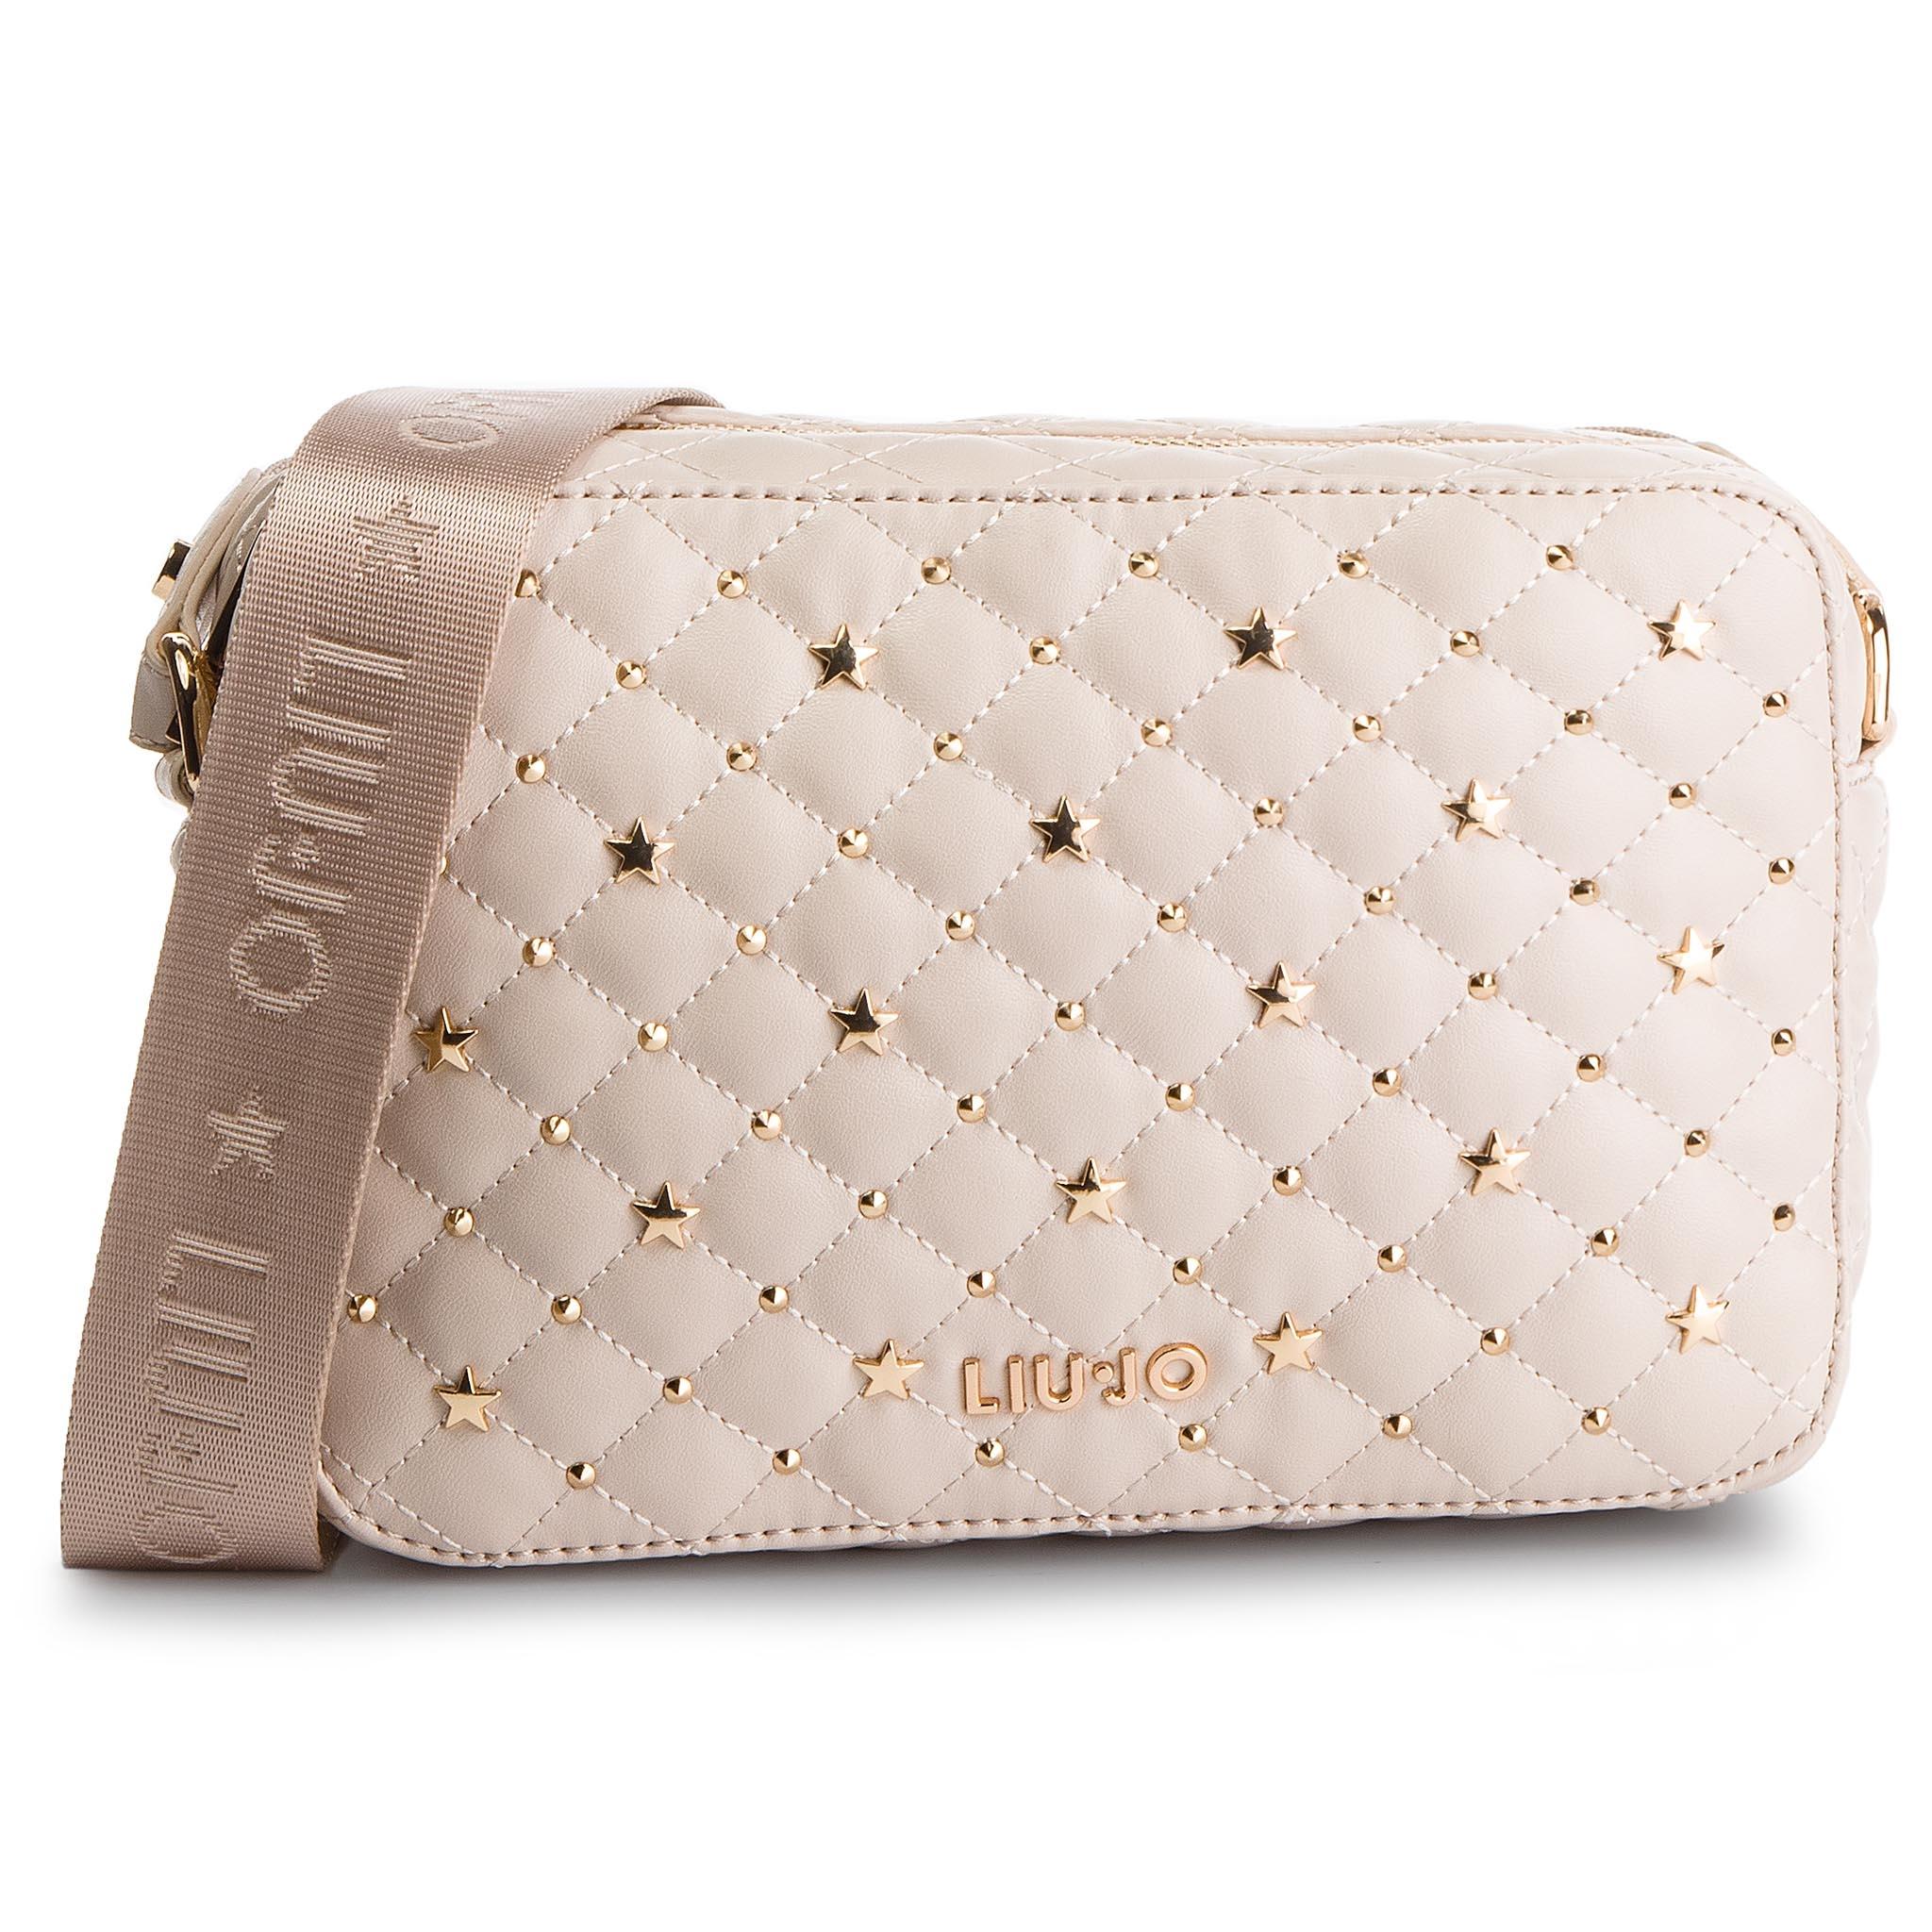 a6fc92f3c5 Handbag LIU JO - Tracollina S Minorca N17074 E0086 Empire Yellow ...